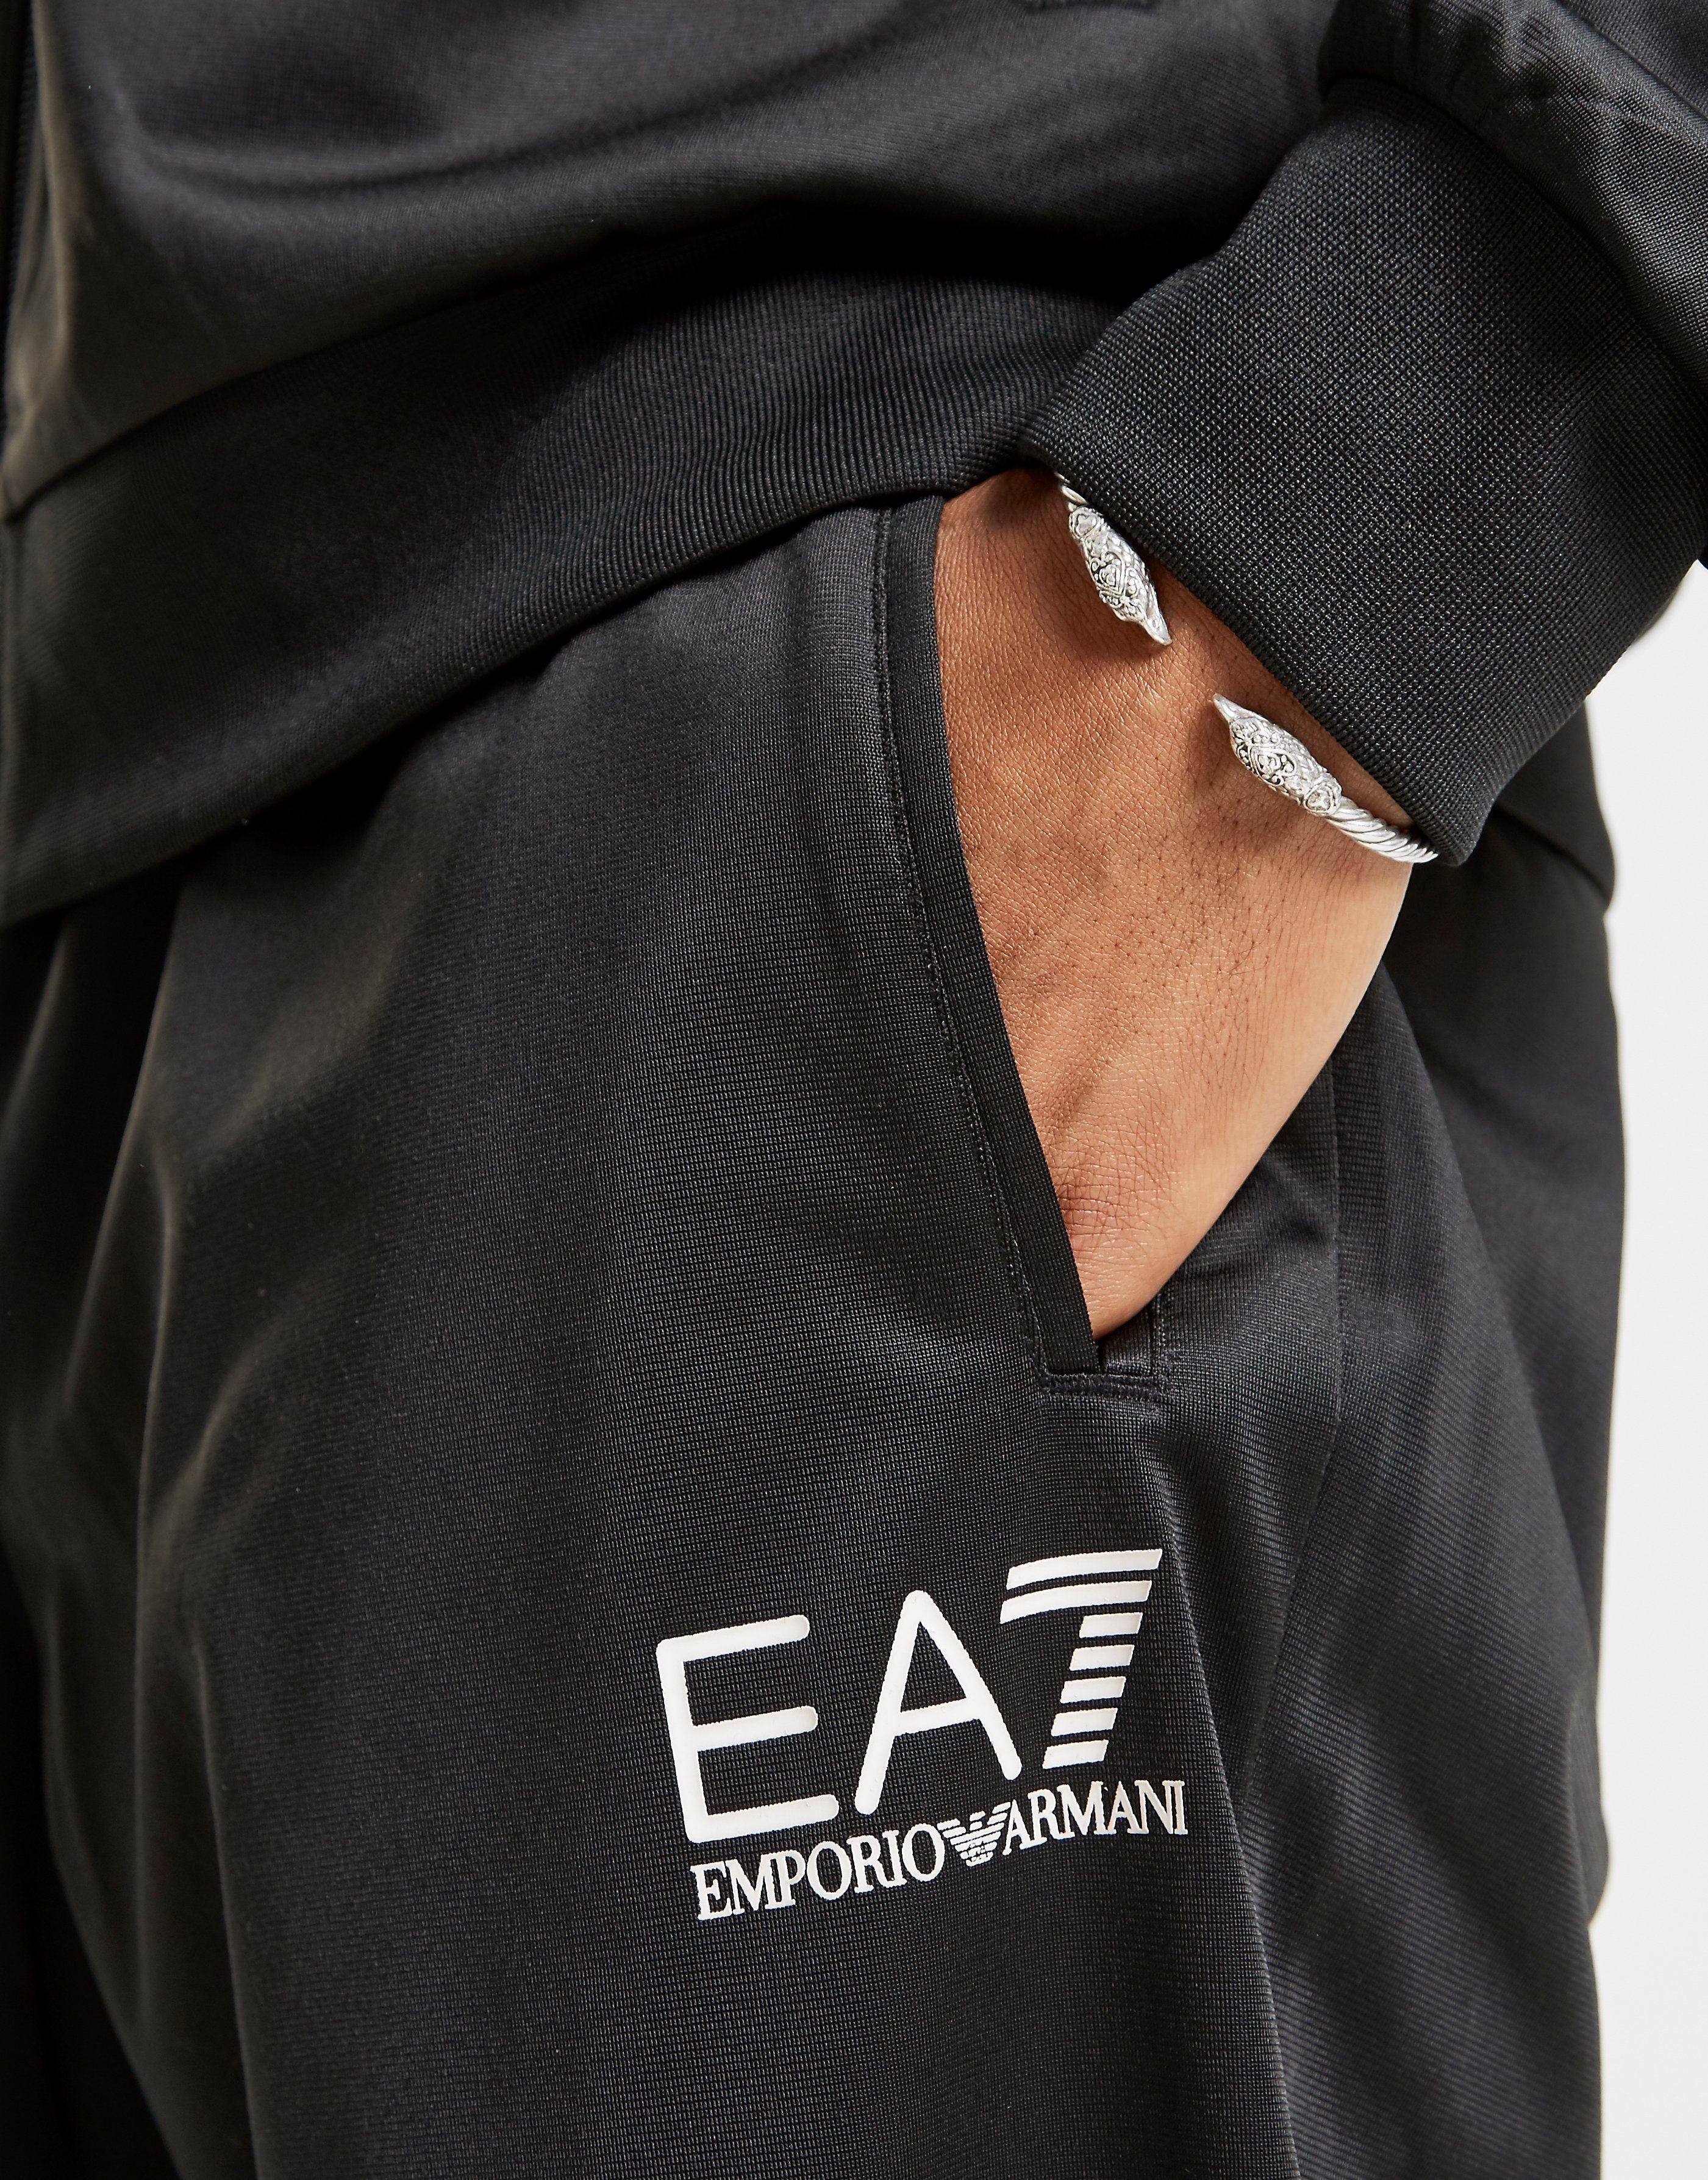 Emporio Armani EA7 Core Poly Tracksuit